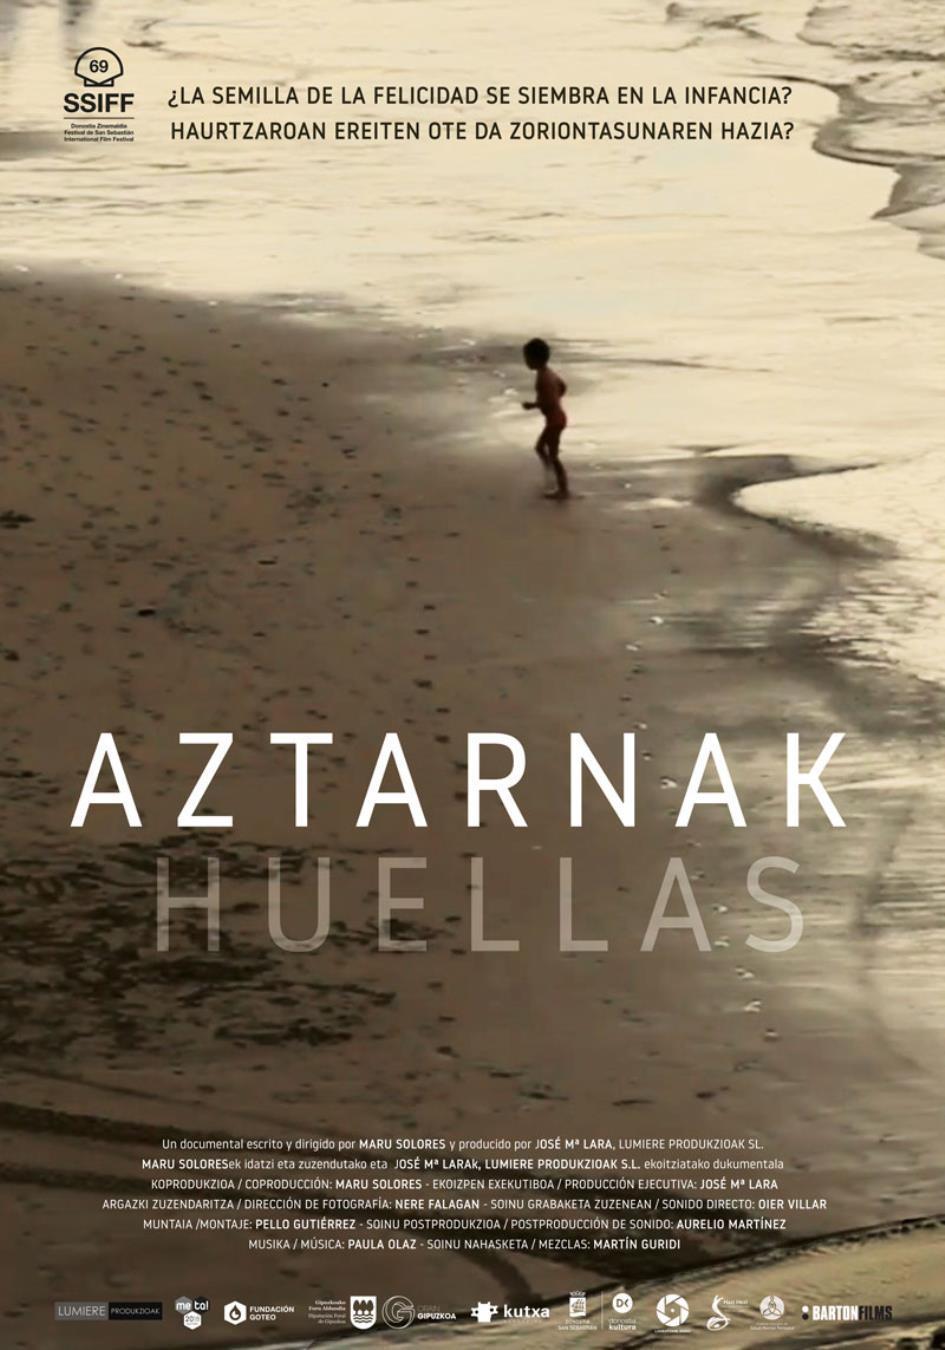 Aztarnak Huellas